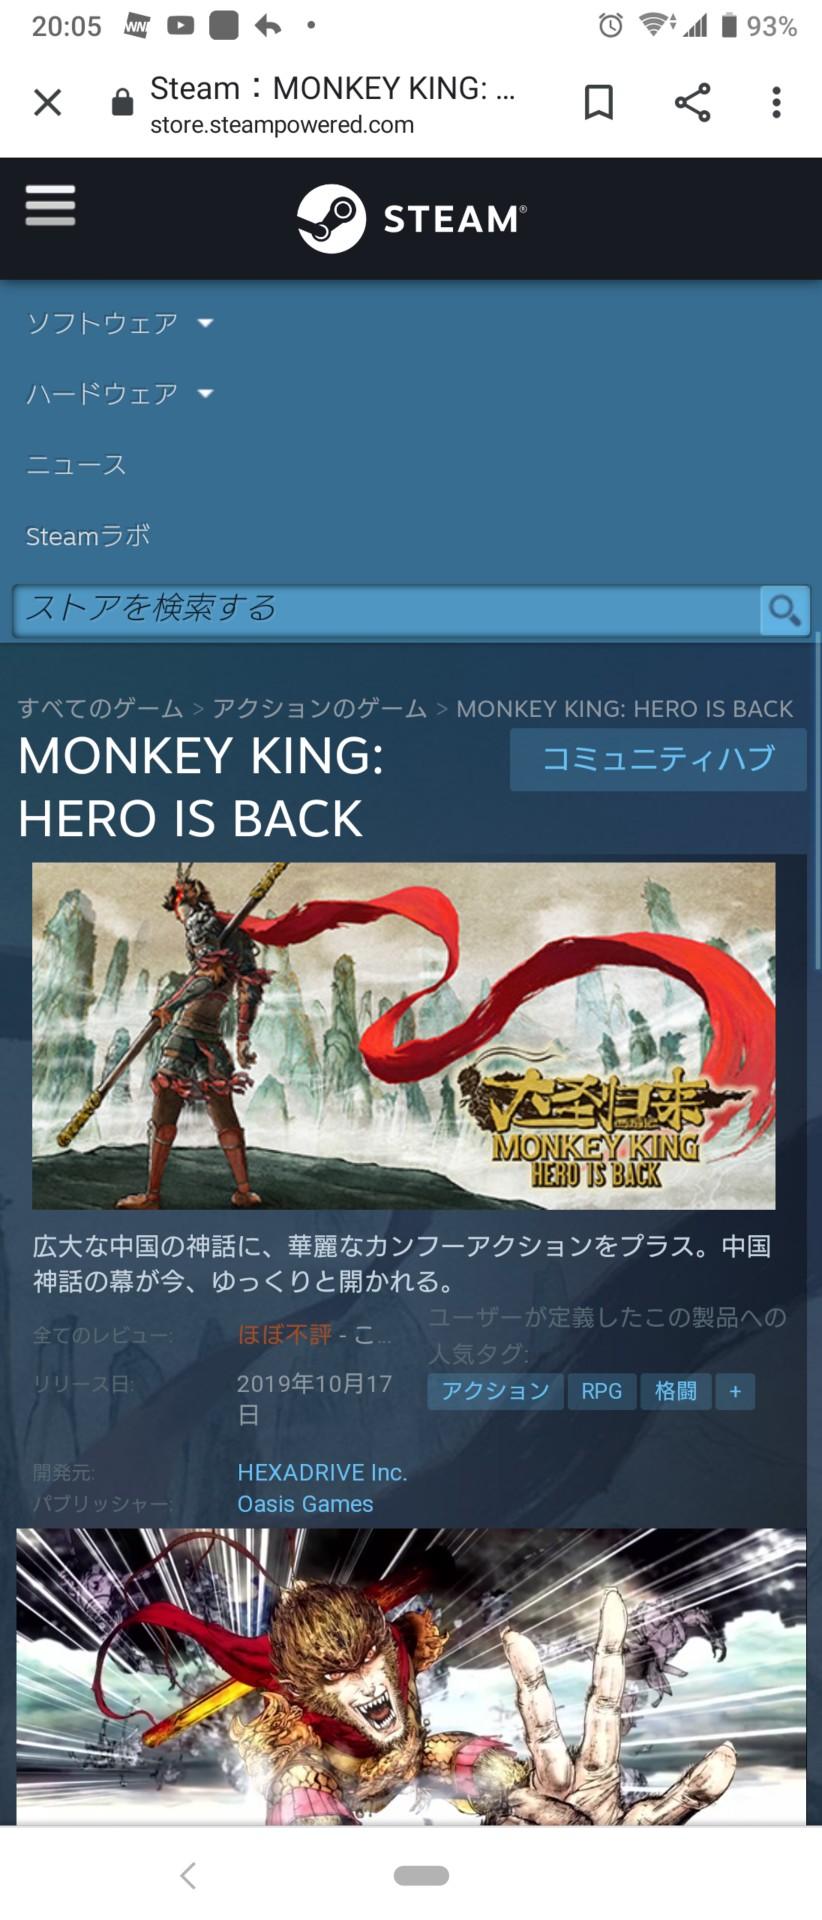 htNhKBu - 【悲報】SIE販売のAAAゲー PS4『MONKEY KING』、売上815本